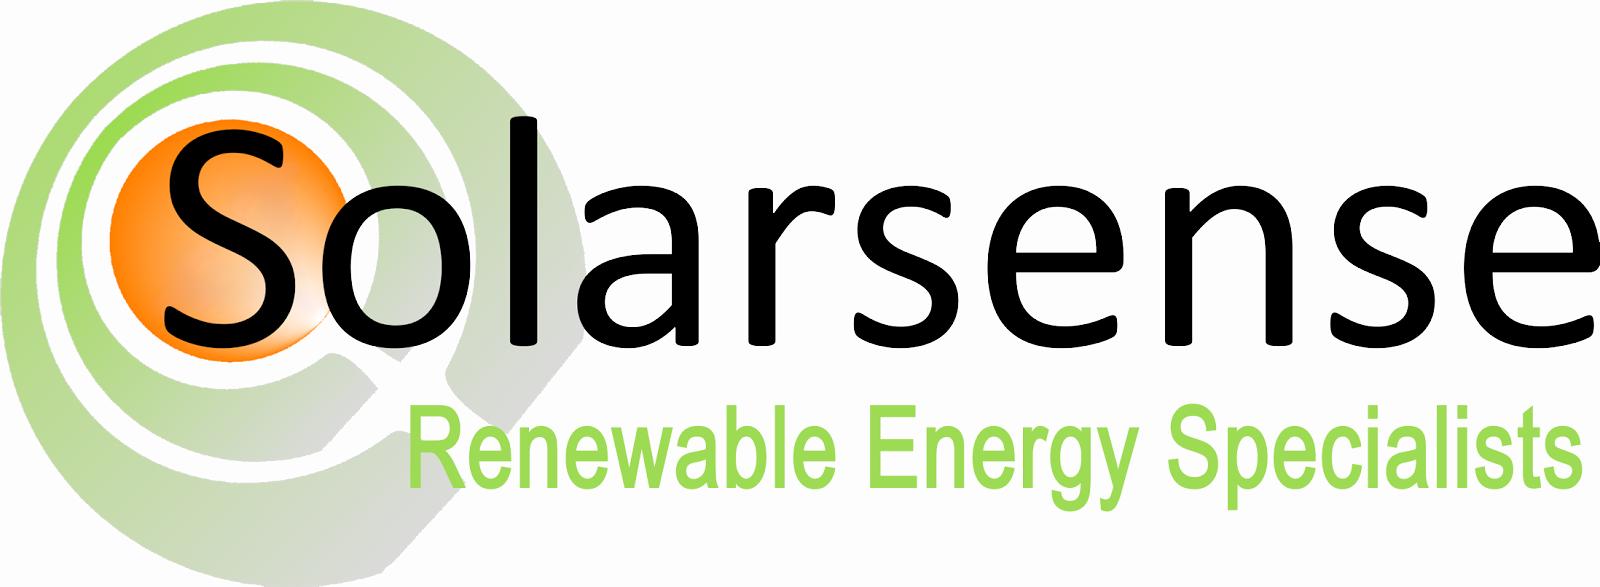 Solarsense